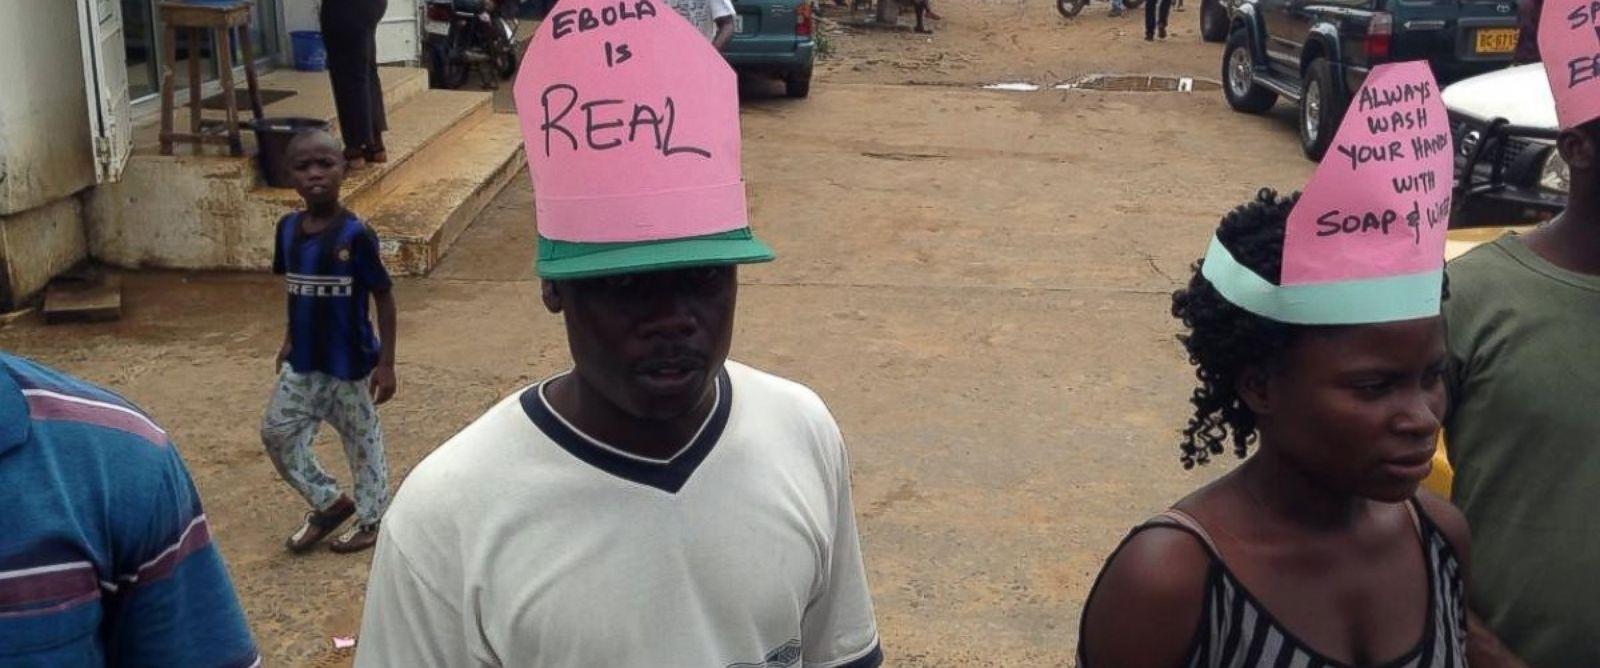 PHOTO: Community educators warn about the dangers of Ebola in Monrovia, Liberia.